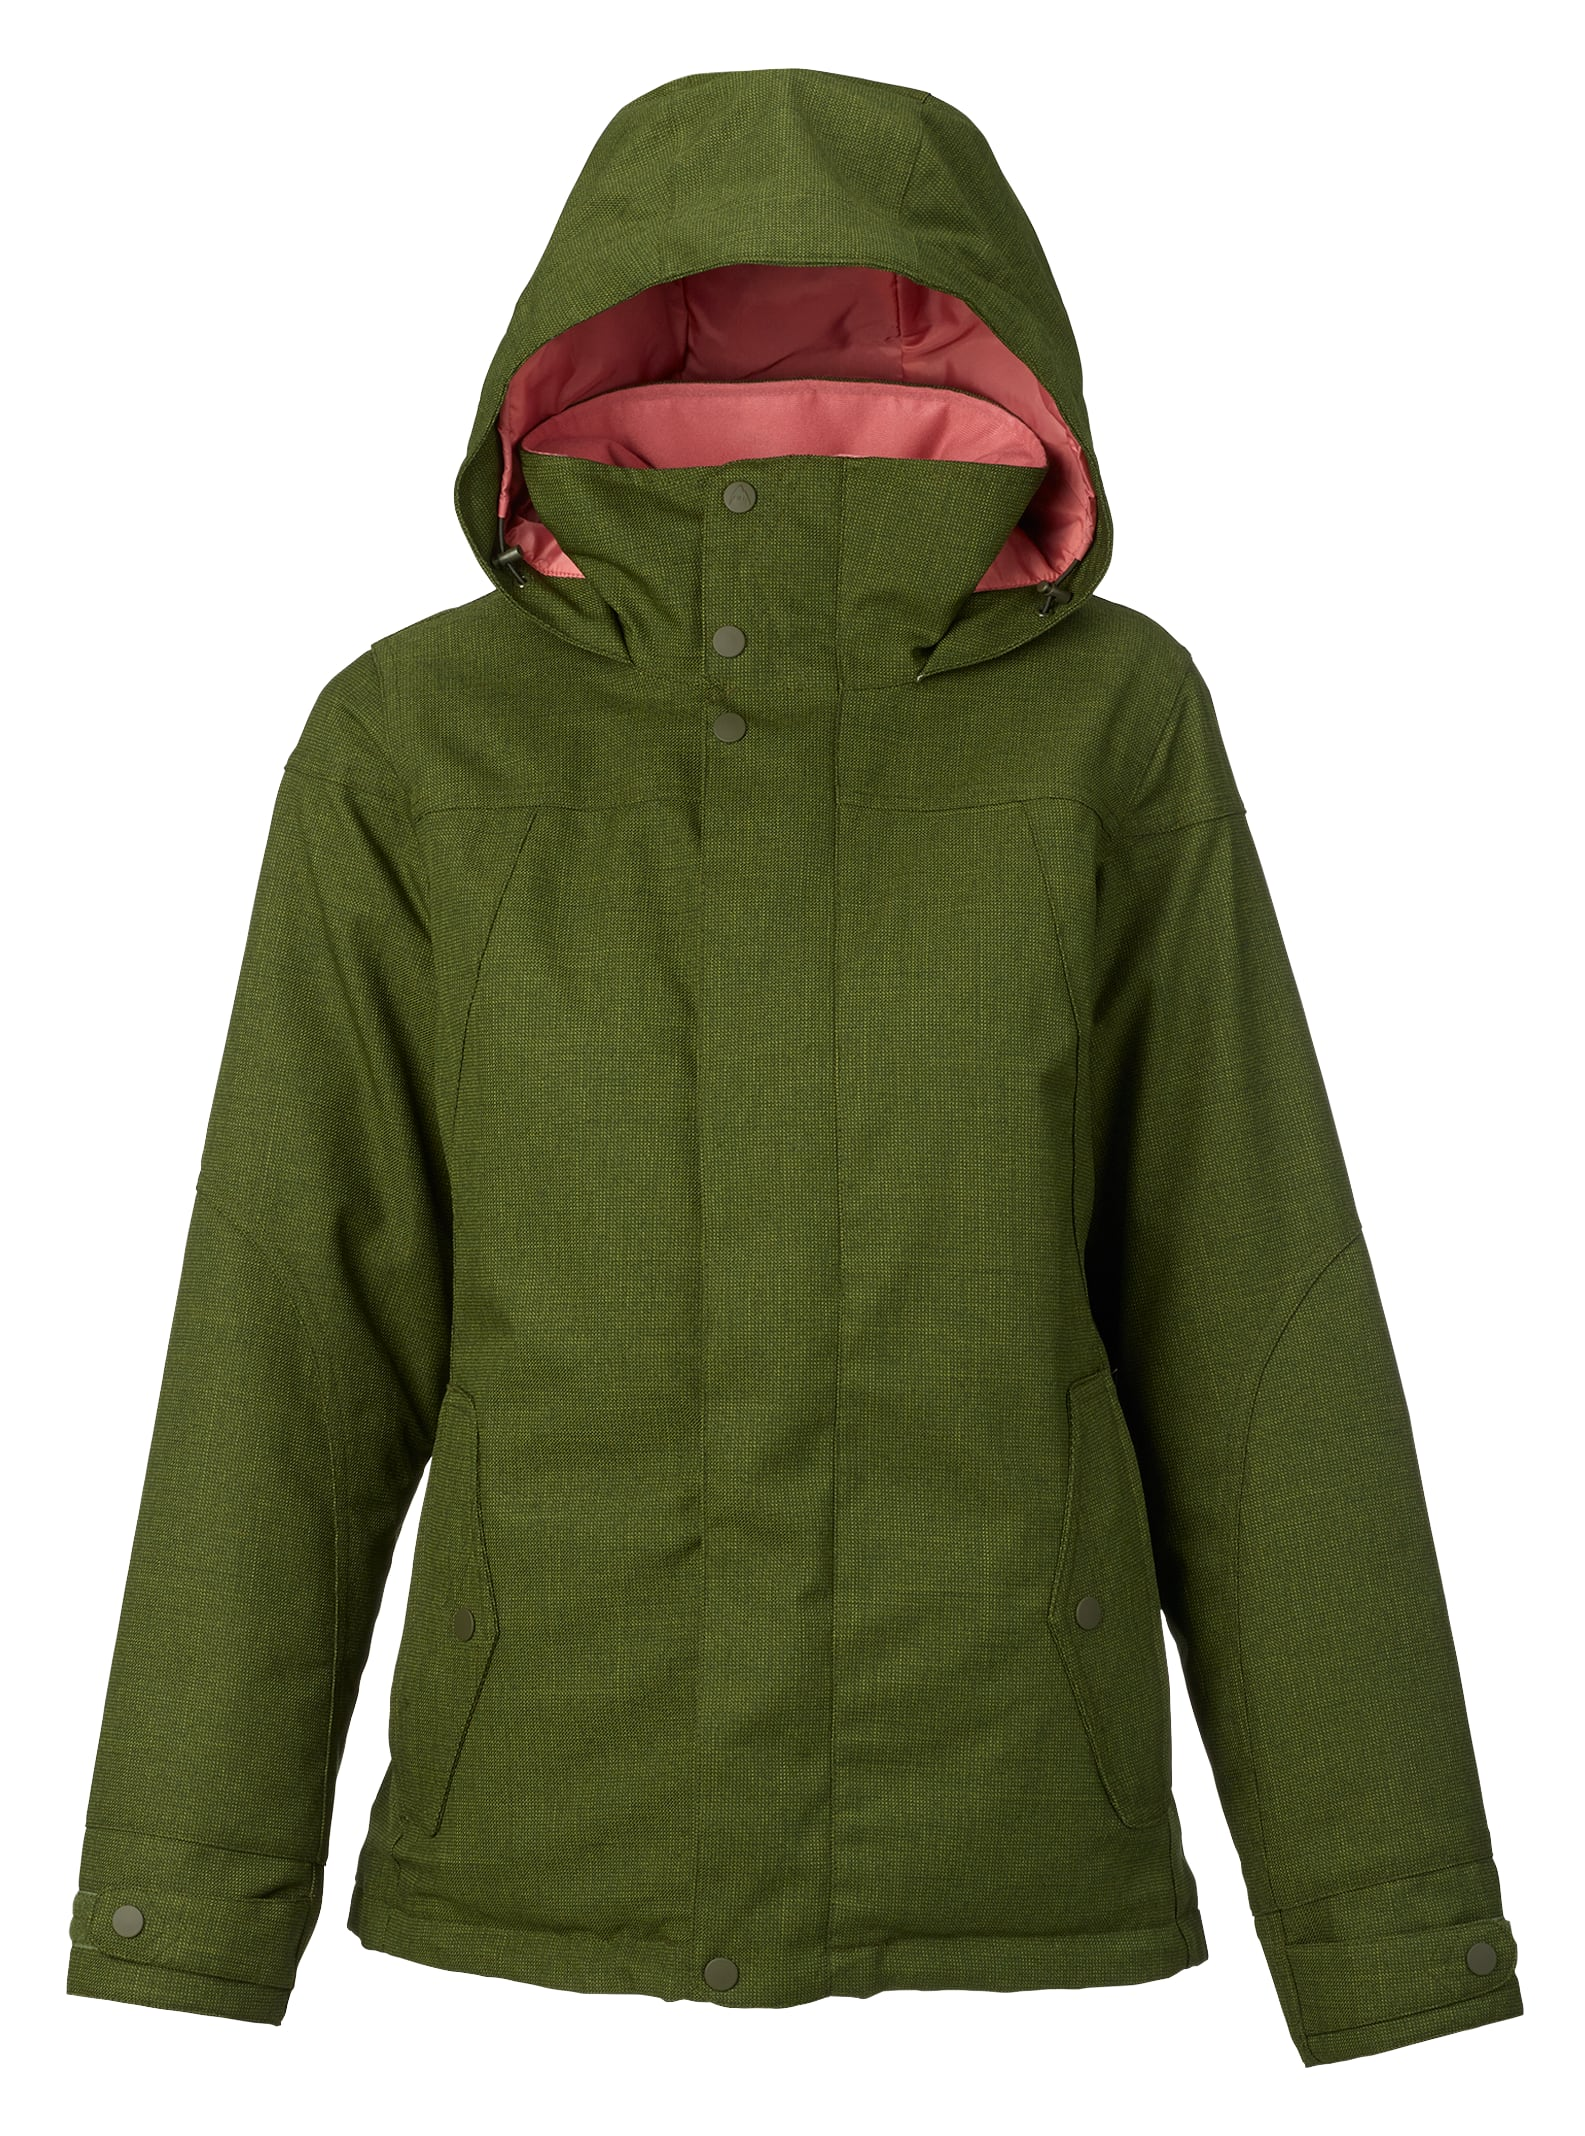 Women's canvas casual jacket